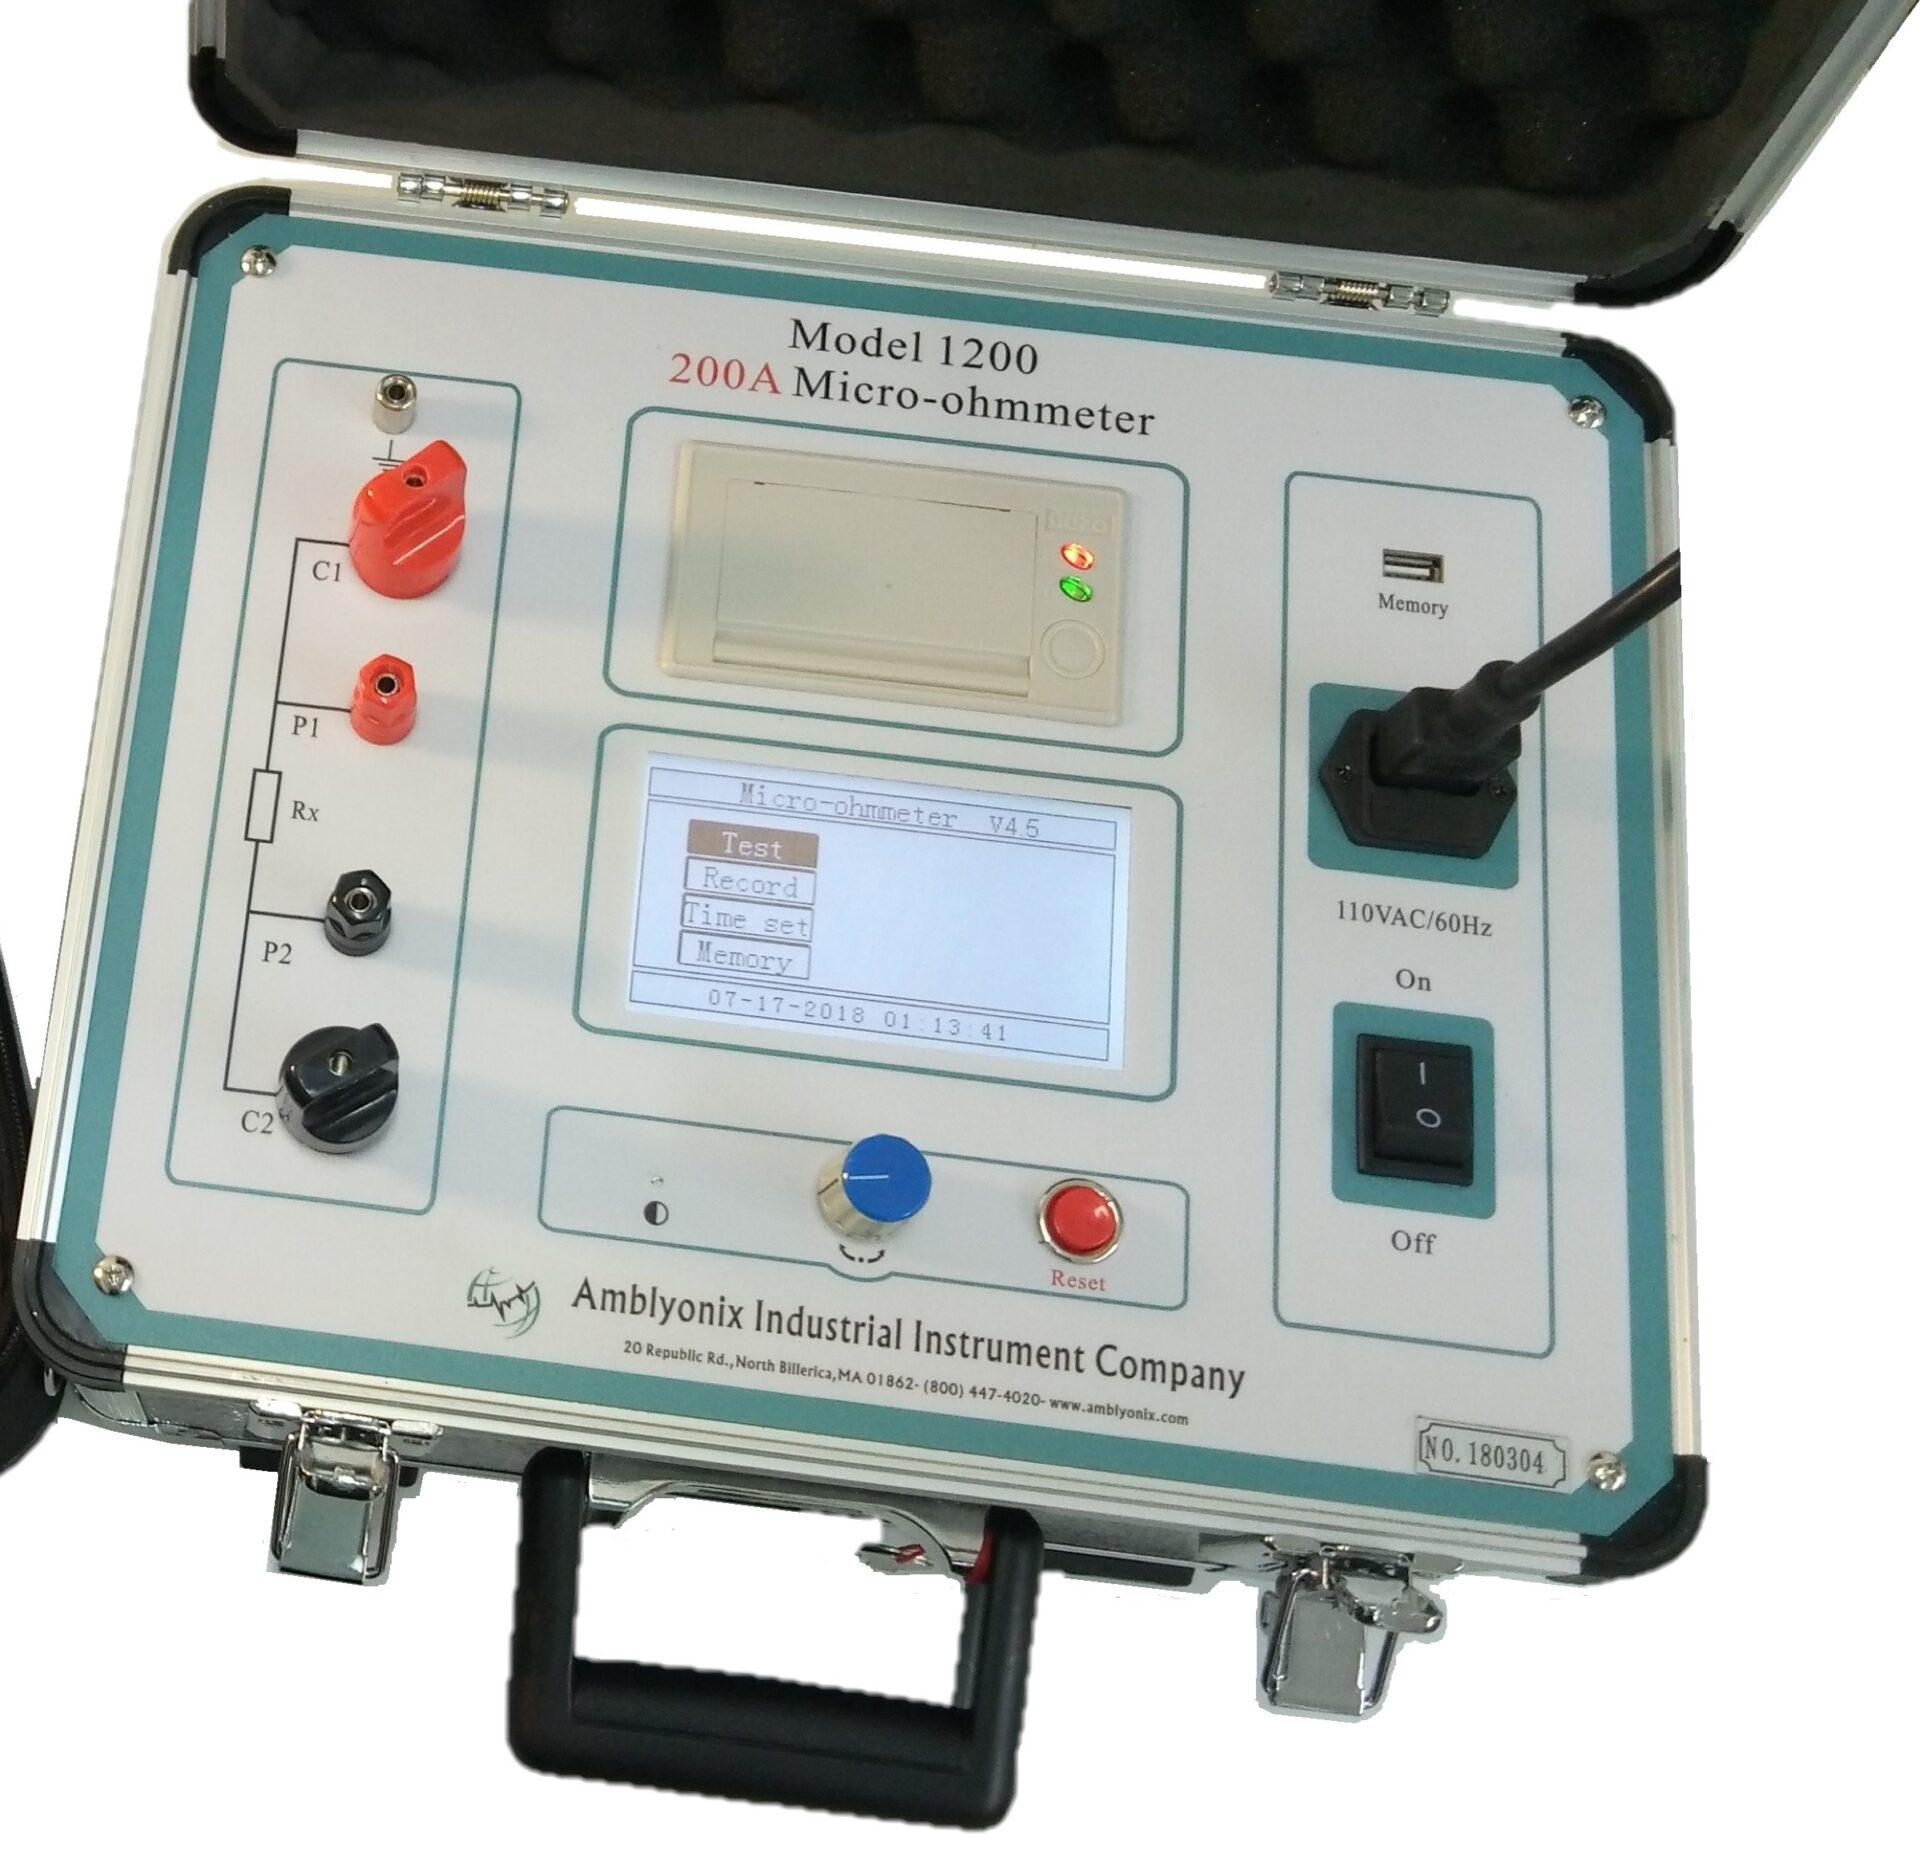 Micro-ohmmeters